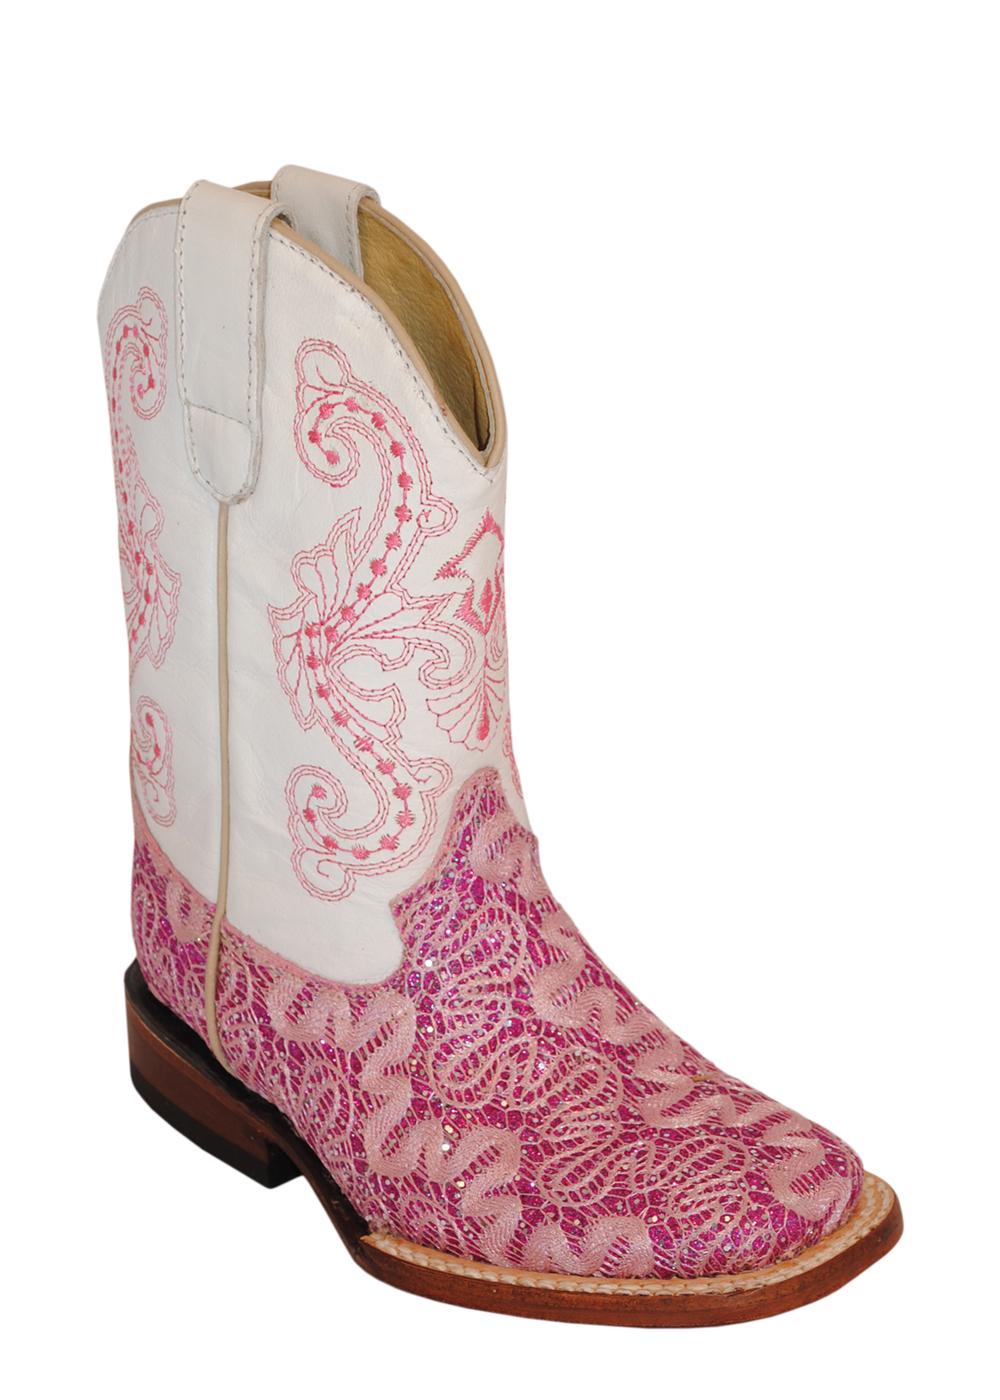 ferrini pink sparkle rockstar s toe leather